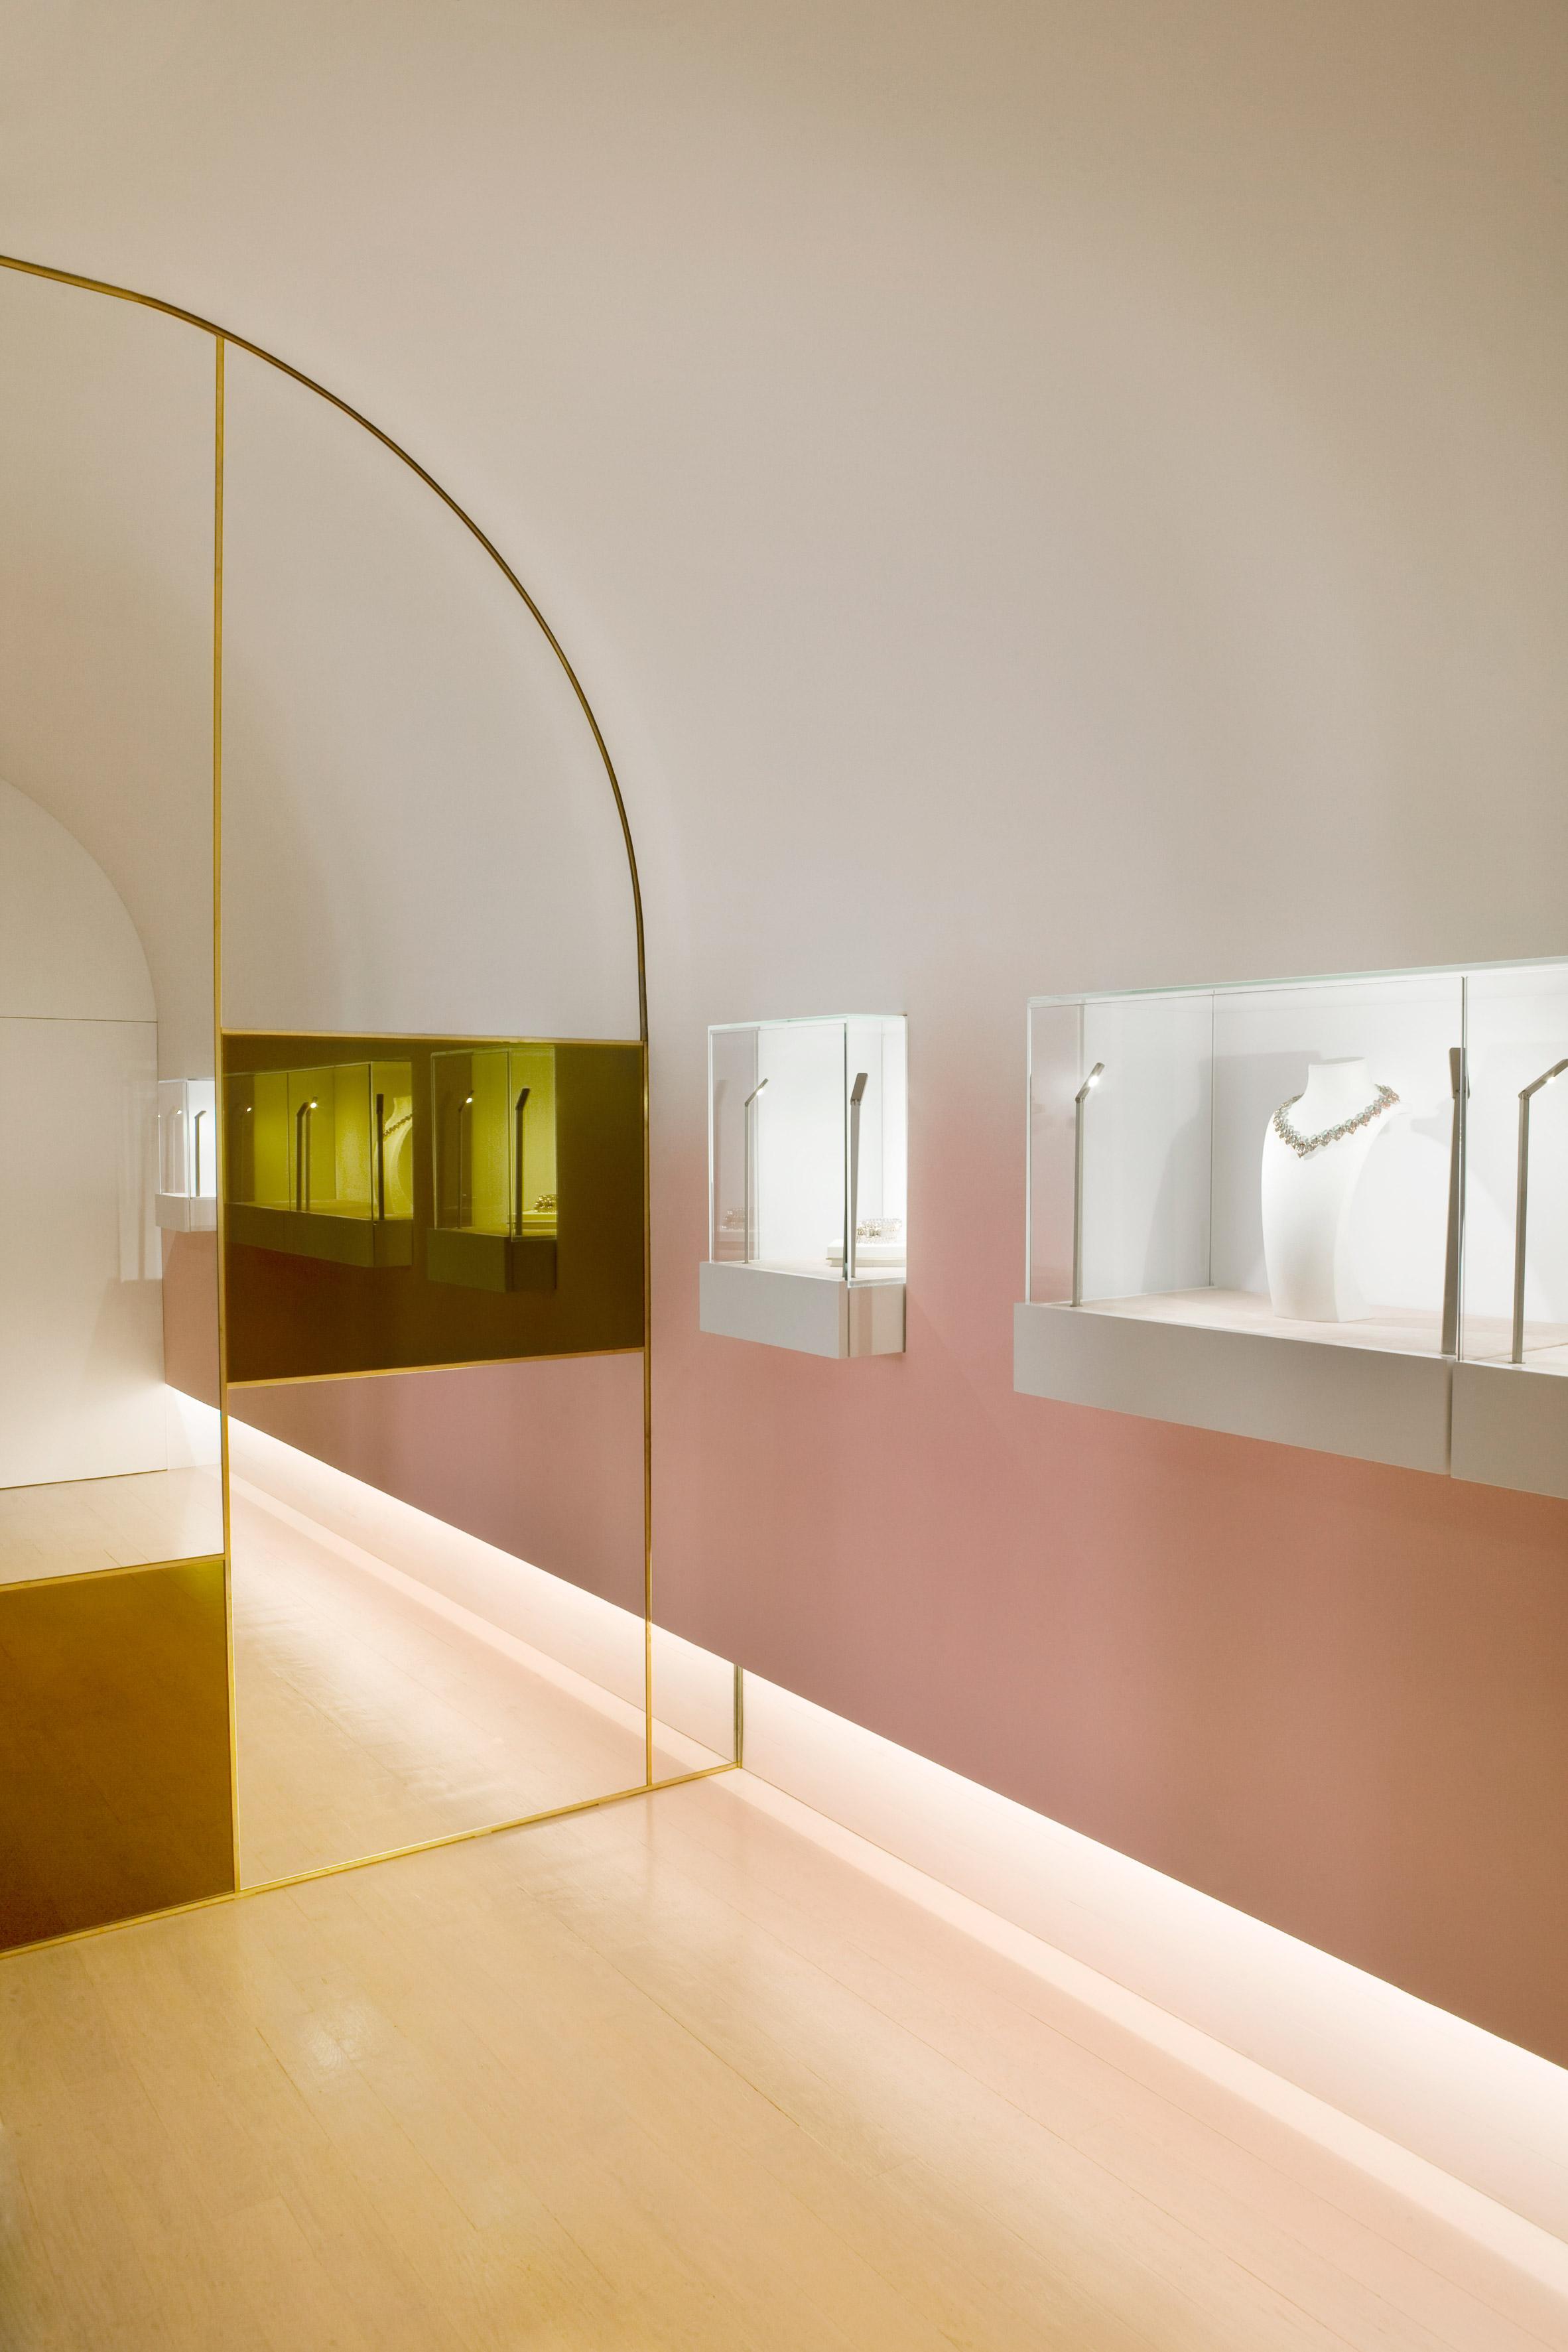 nuun-jewellery-shop-java-architectes-interiors-retail-paris-france_dezeen_2364_col_6.jpg